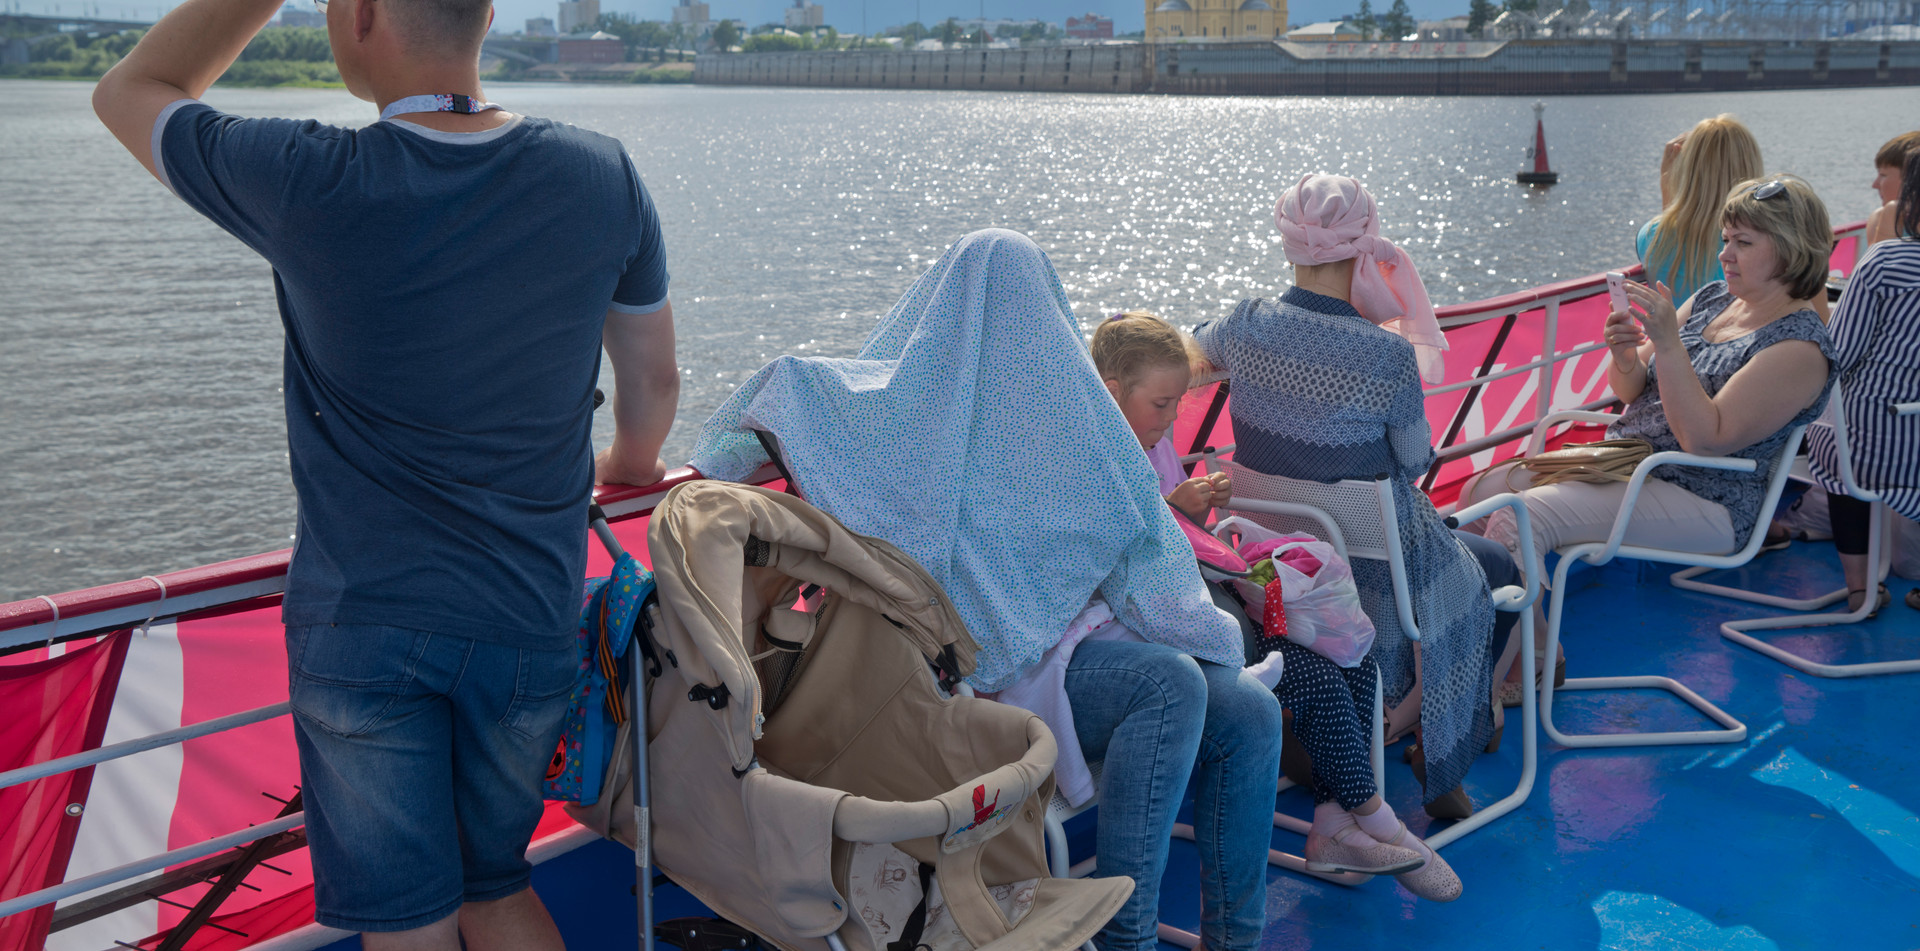 Families on a ferry trip on the Volga river in Nizhny Novgorod, Russia